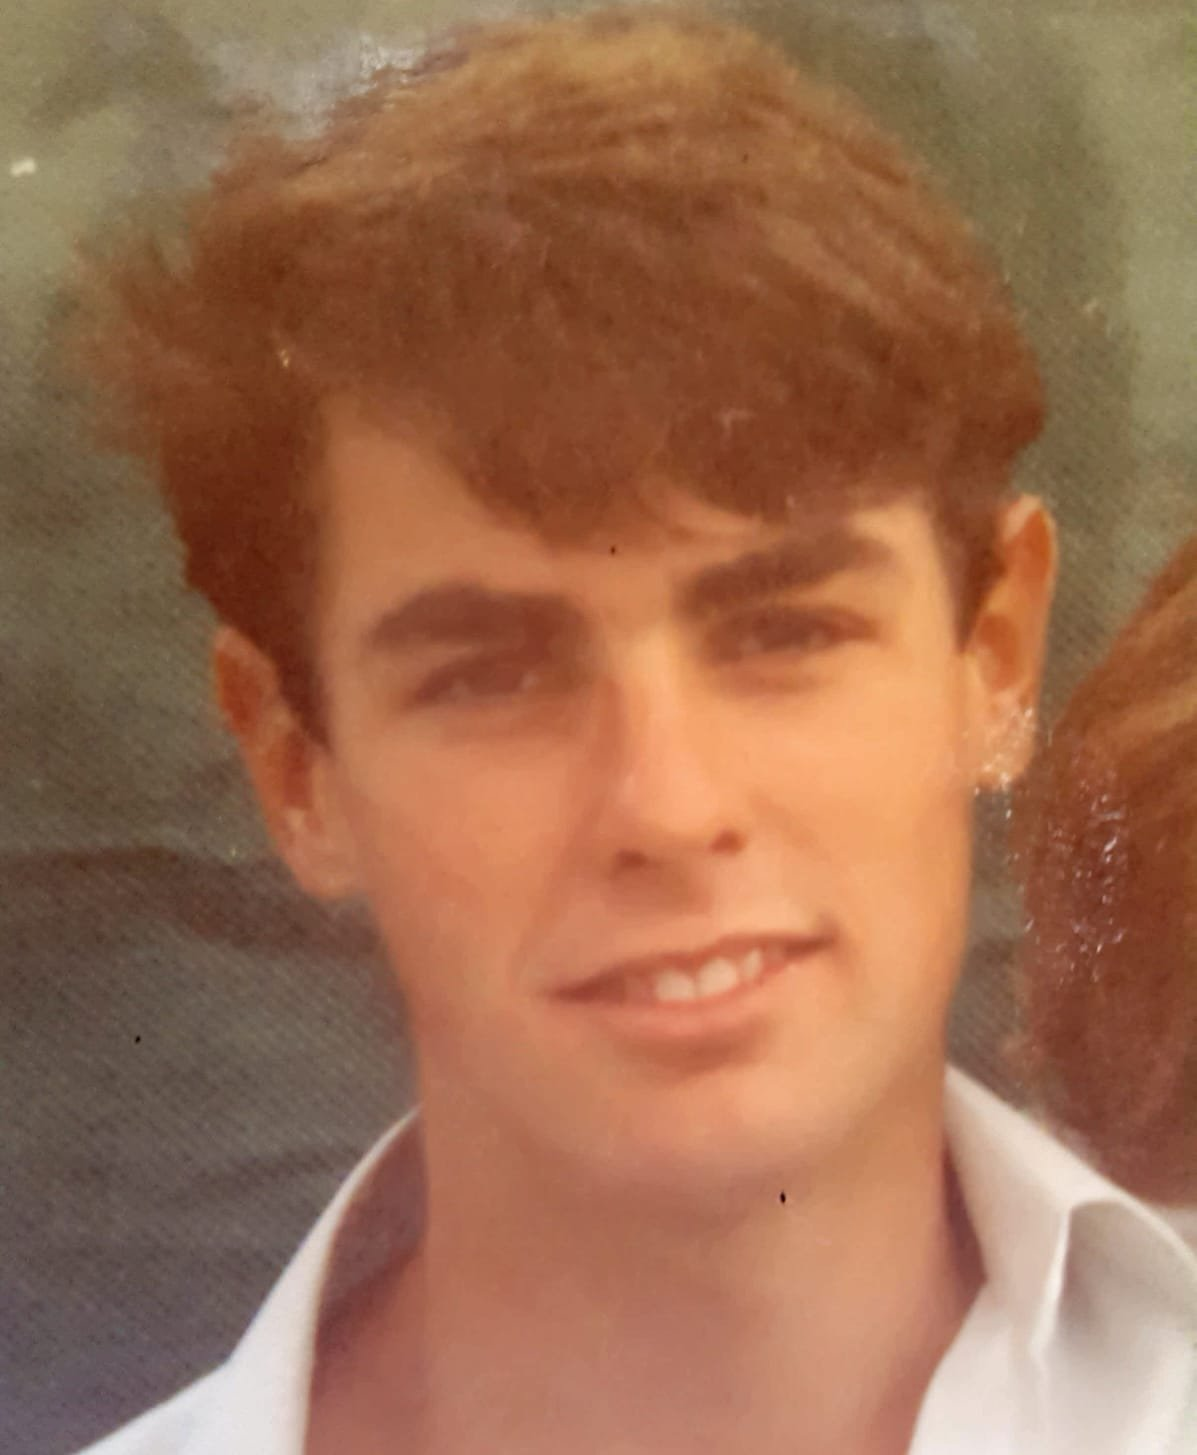 Edward John Sandes (1969 - 1986)